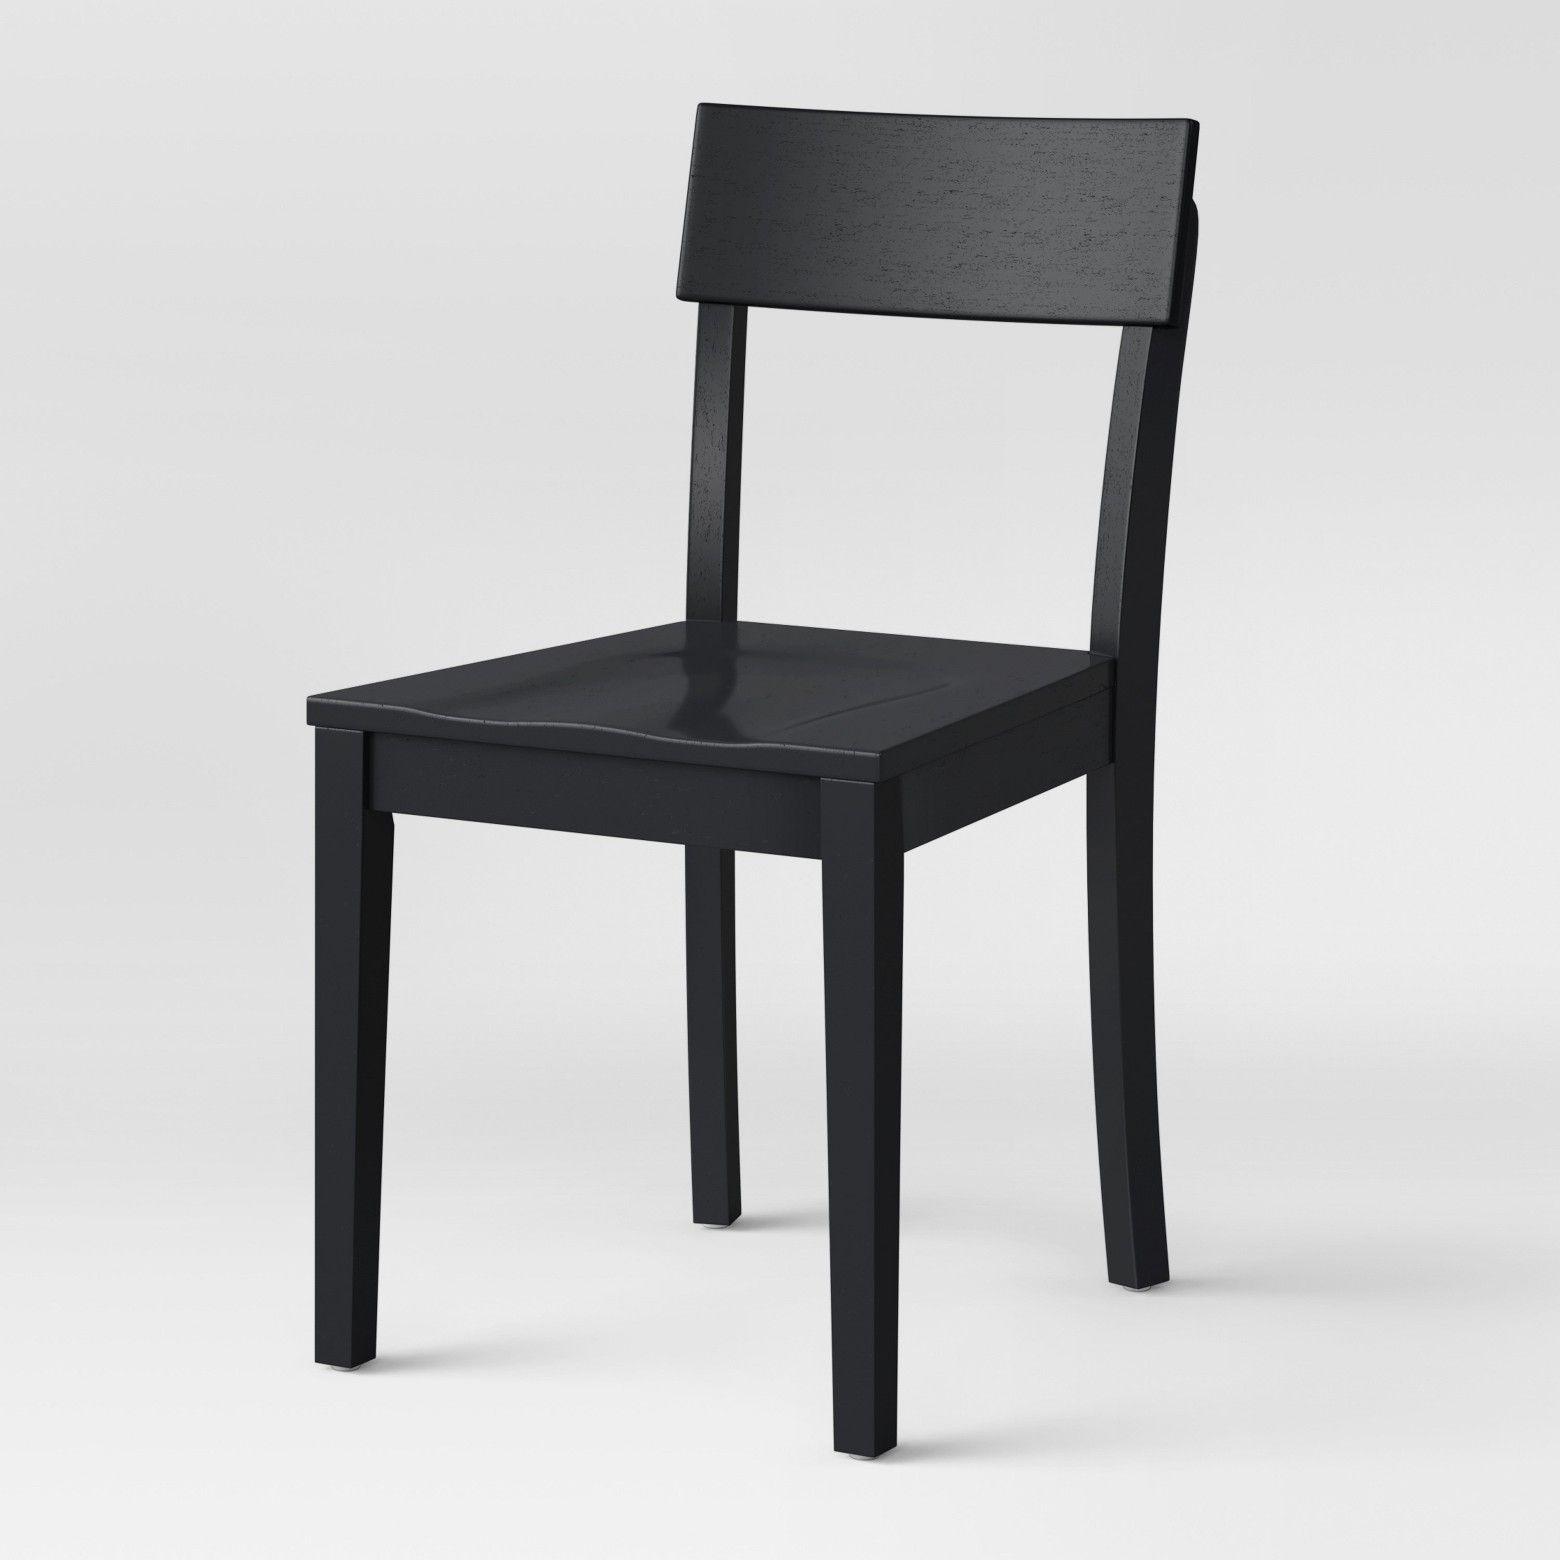 Bethesda Modern Dining Chair Set of 2